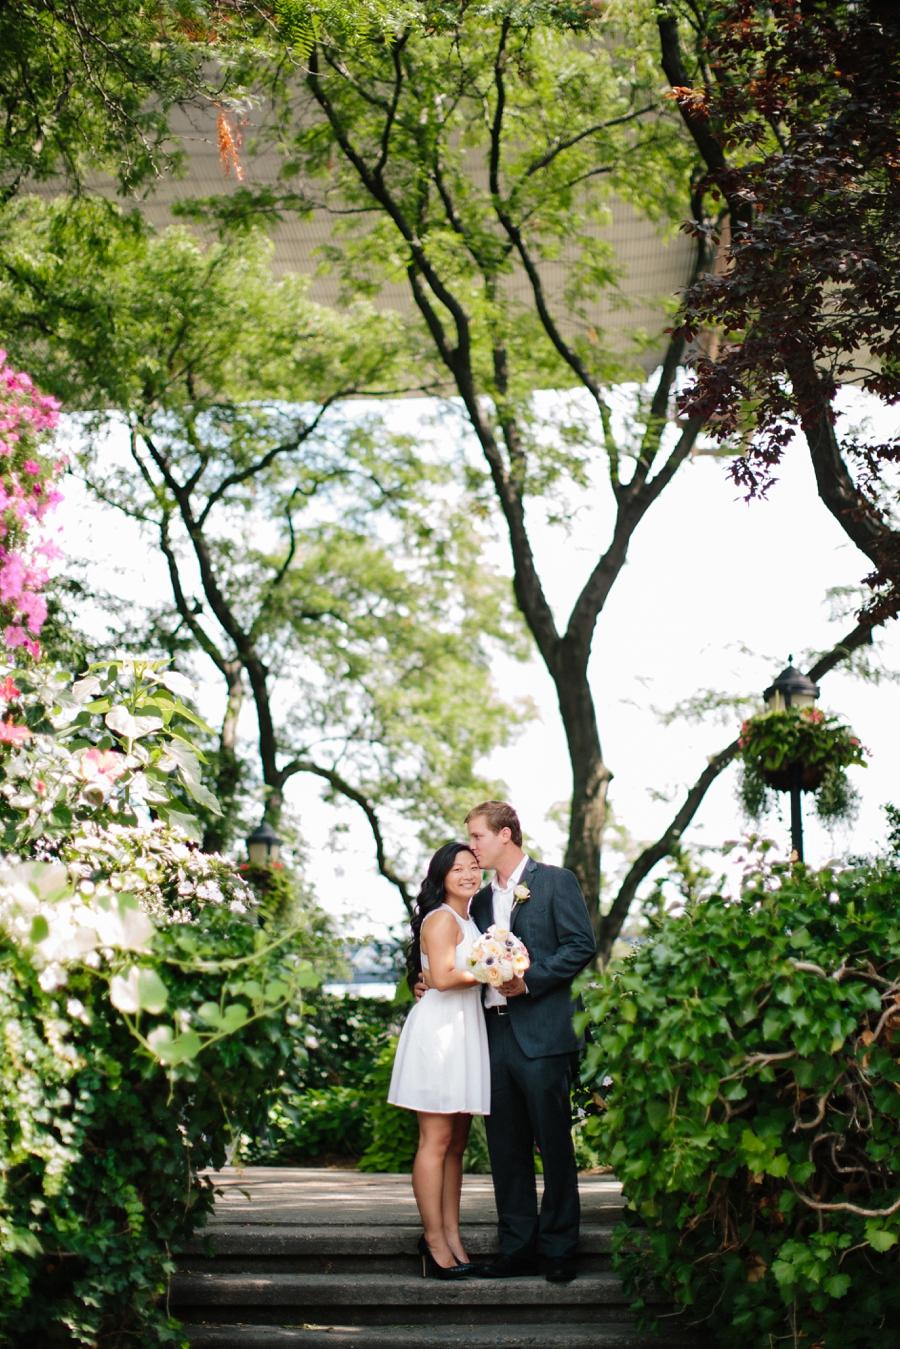 elopement-wedding-photographer-ny-nj-destination_0025.jpg